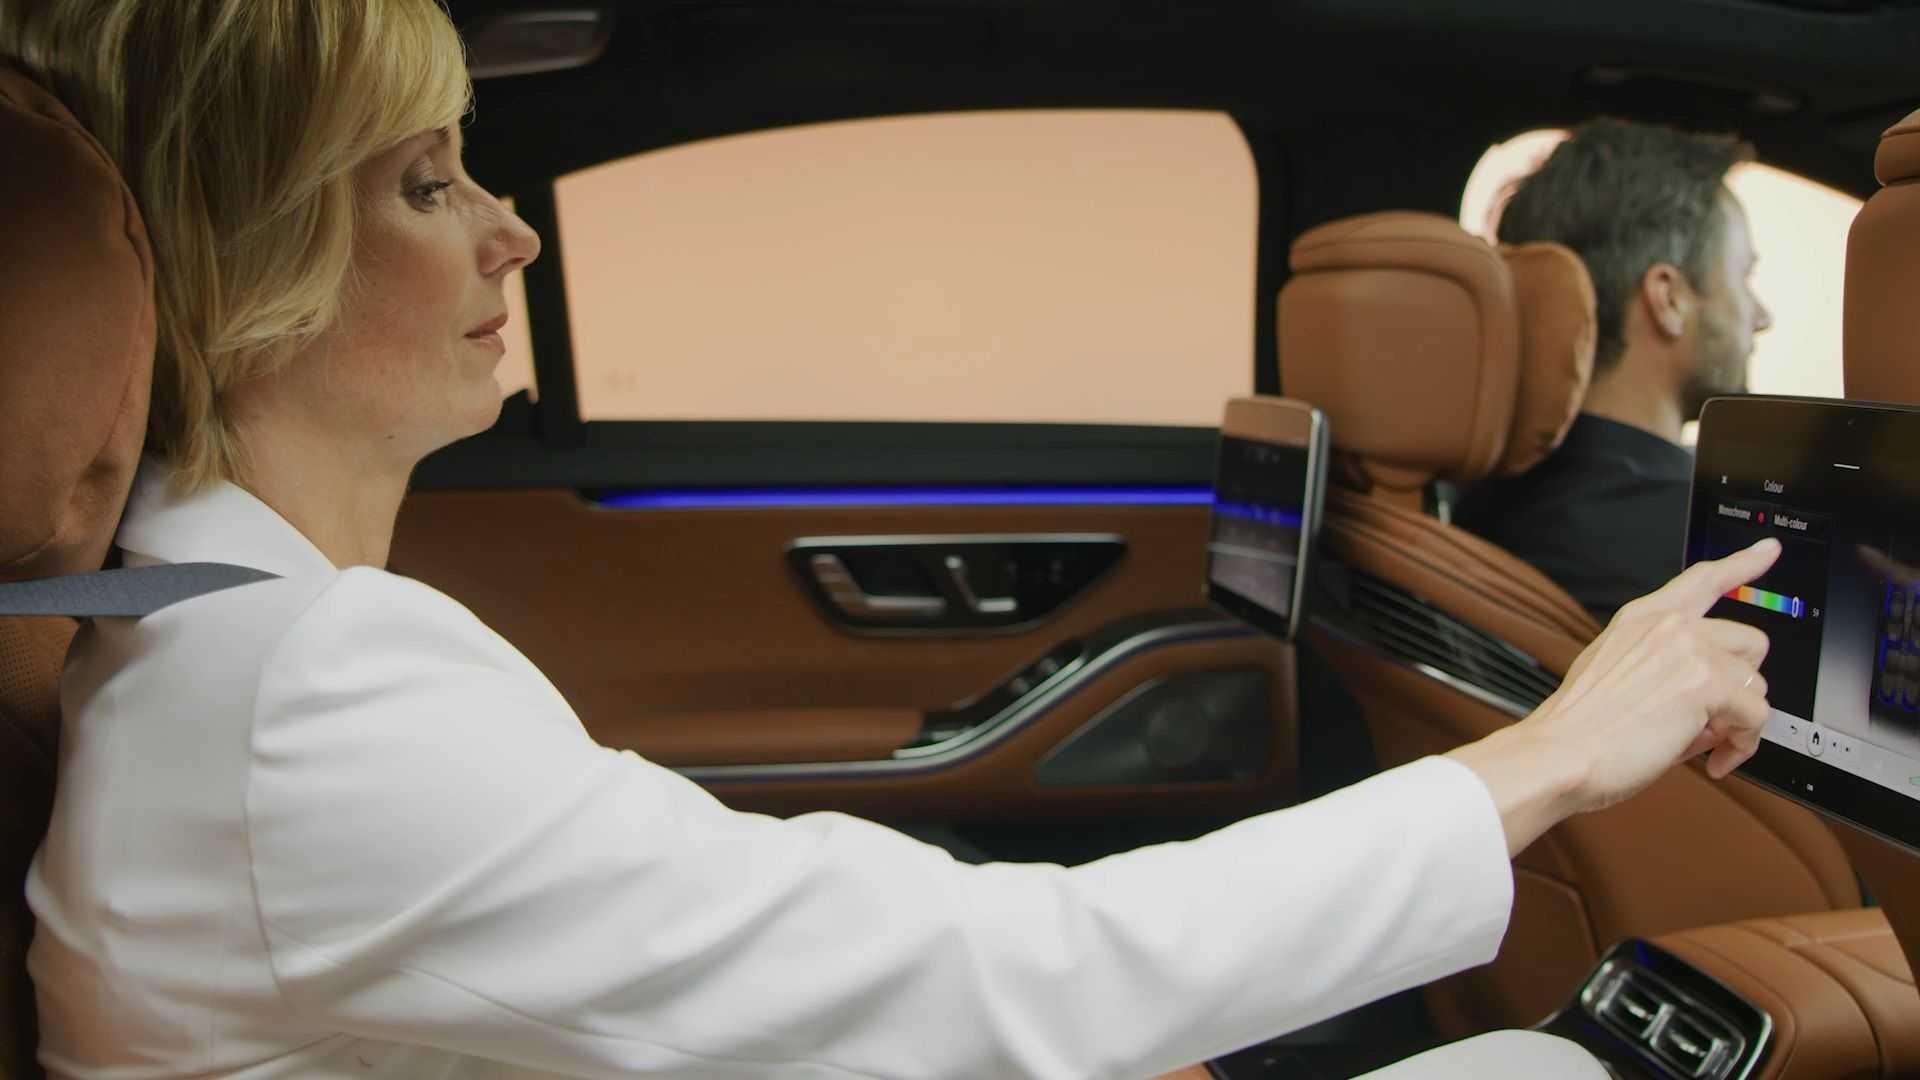 2021-mercedes-s-class-interior-14